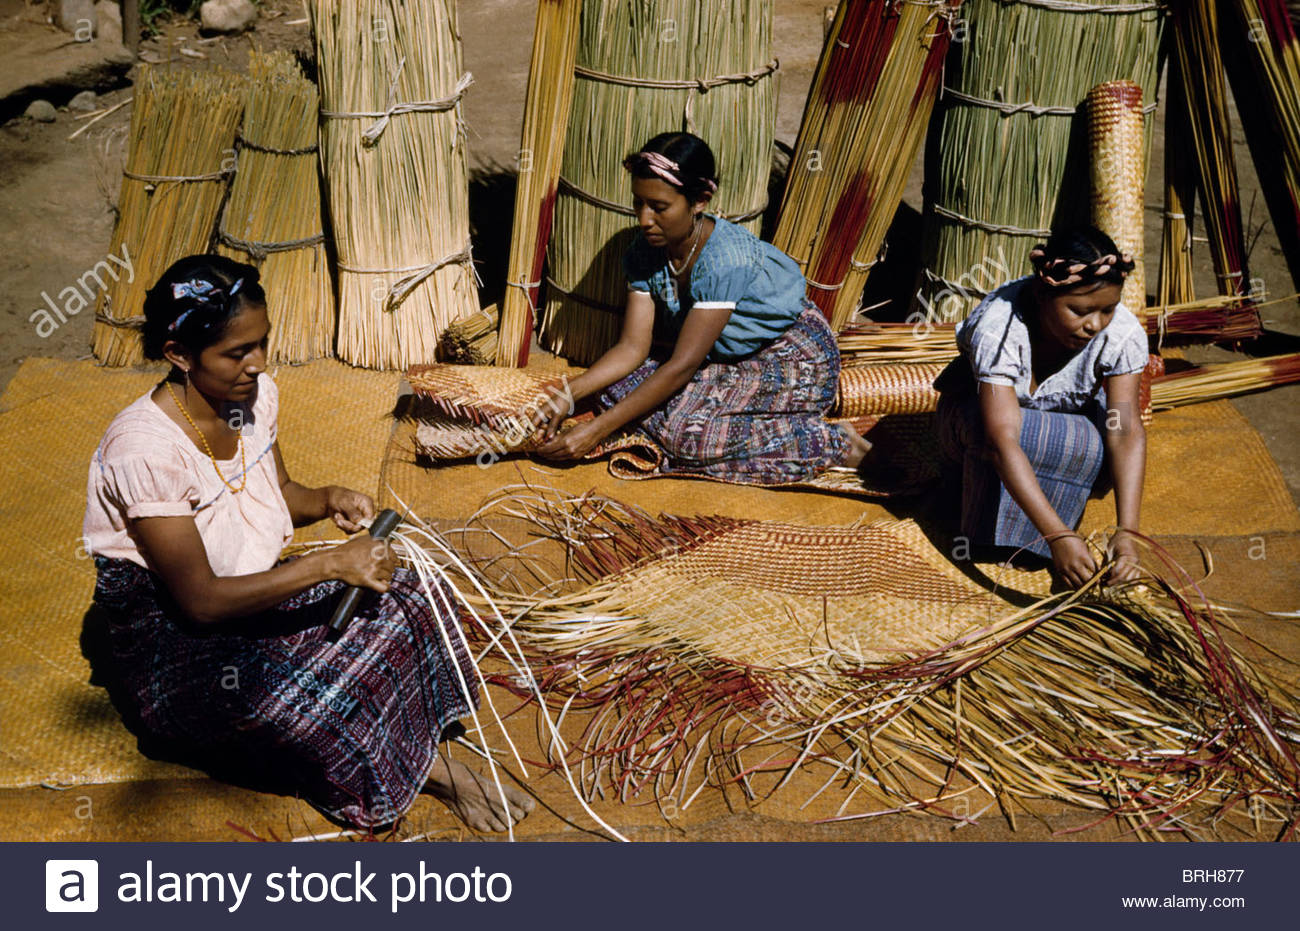 Floor mats to sleep on - Stock Photo Women Make Sleeping Mats Called Petate And Floor Mats From Tule